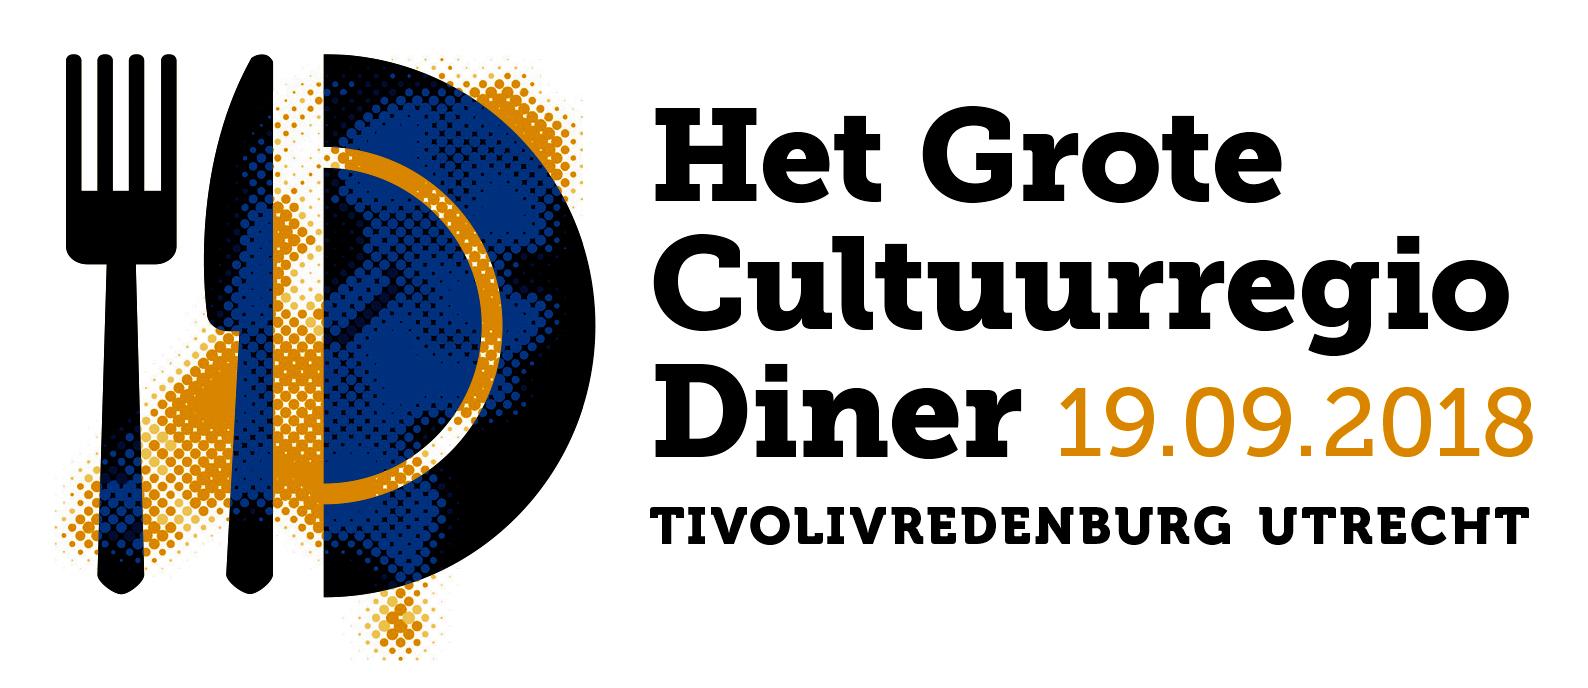 invitation grote culturele diner_landscape